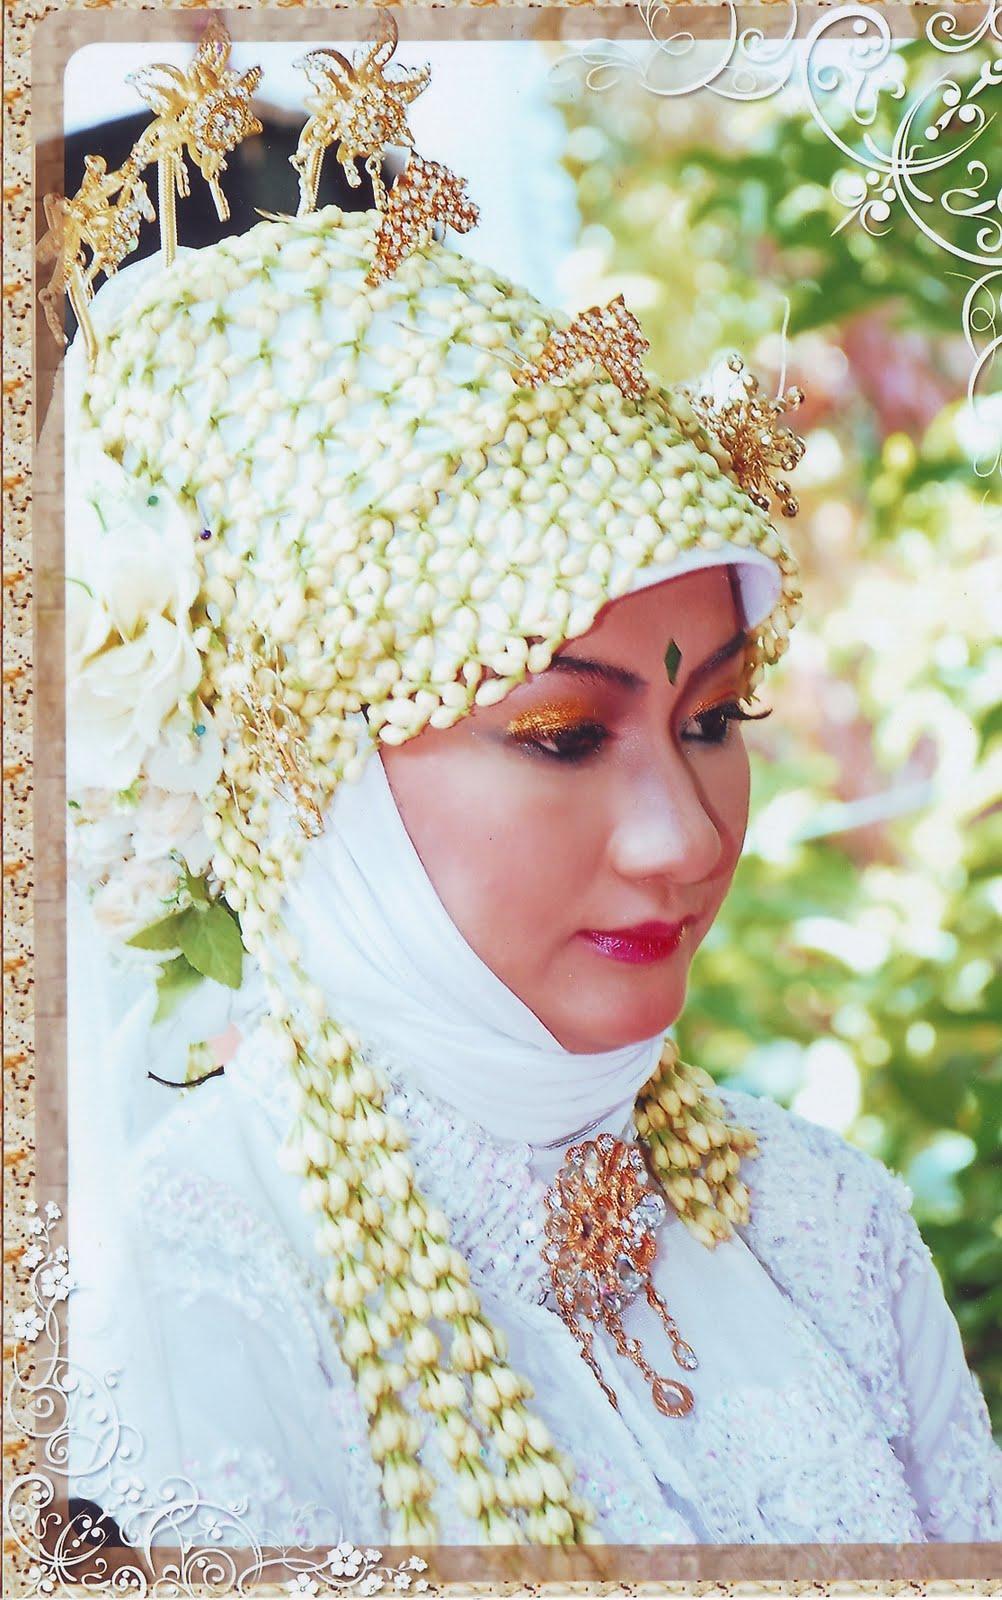 hasil karya riasan pengantin dari bunda rias pengantin